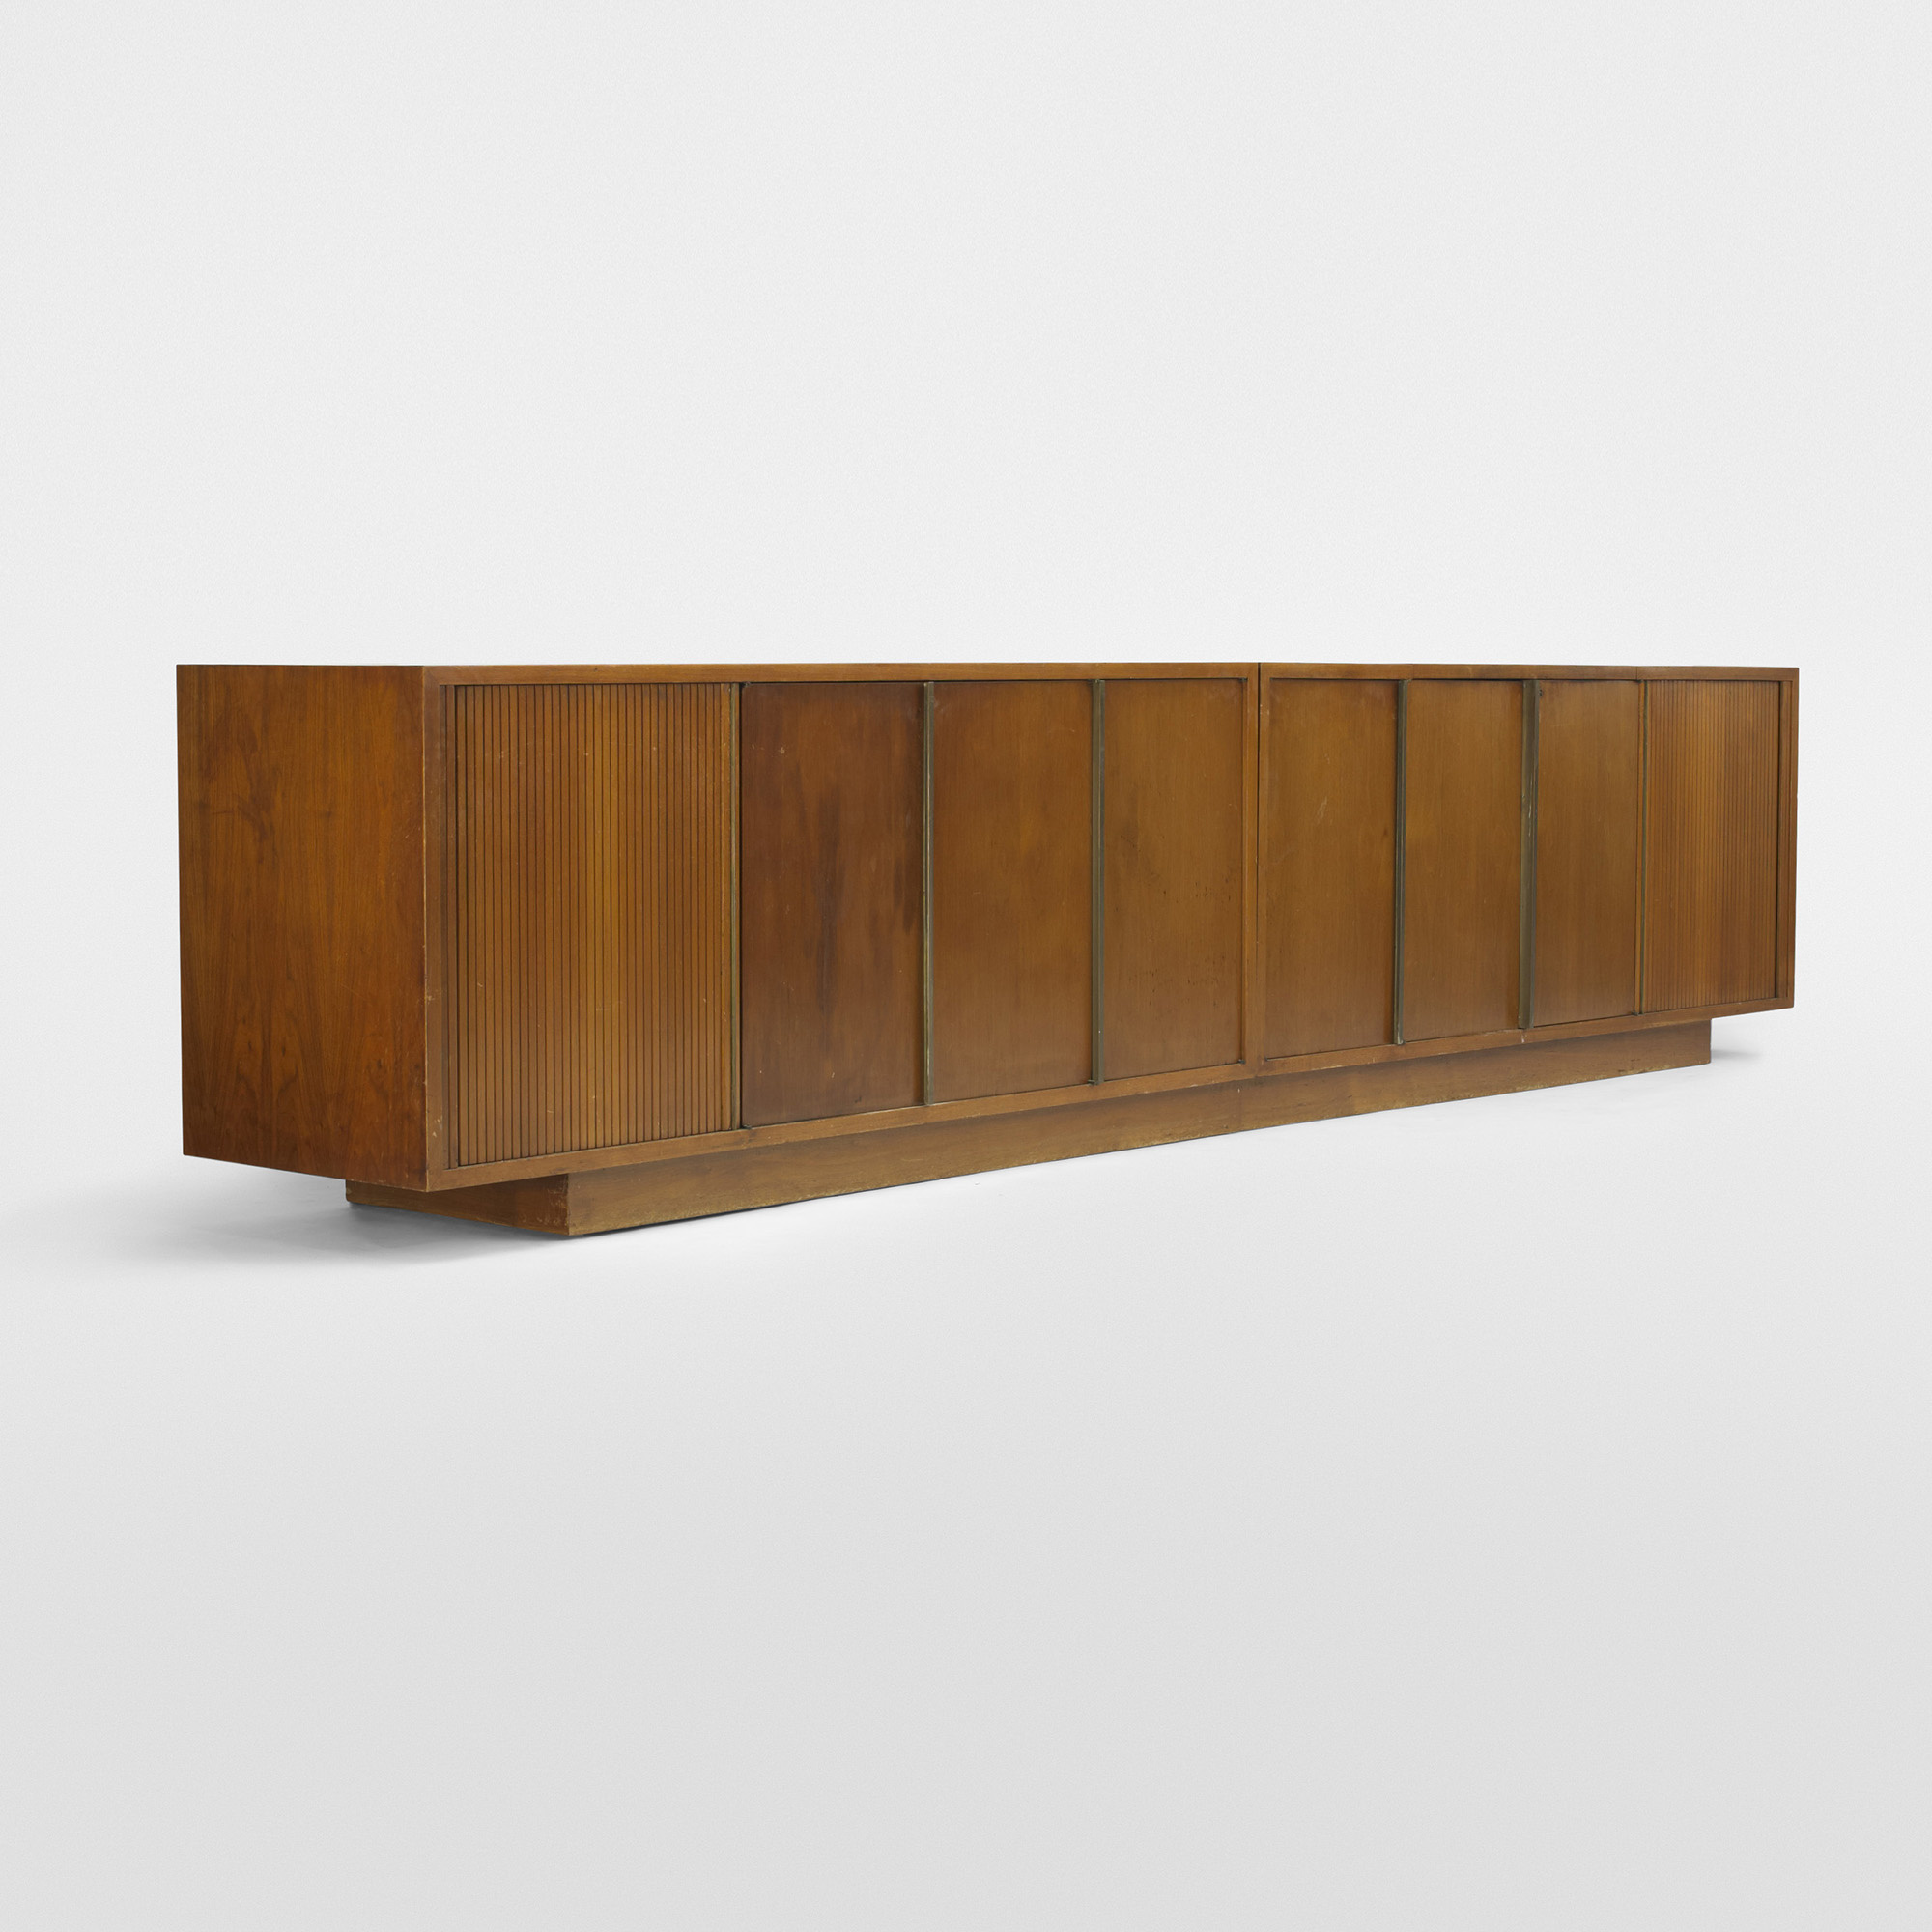 Modern Home Design October 2012: 217: VLADIMIR KAGAN, Cabinet From A Manhattan Interior